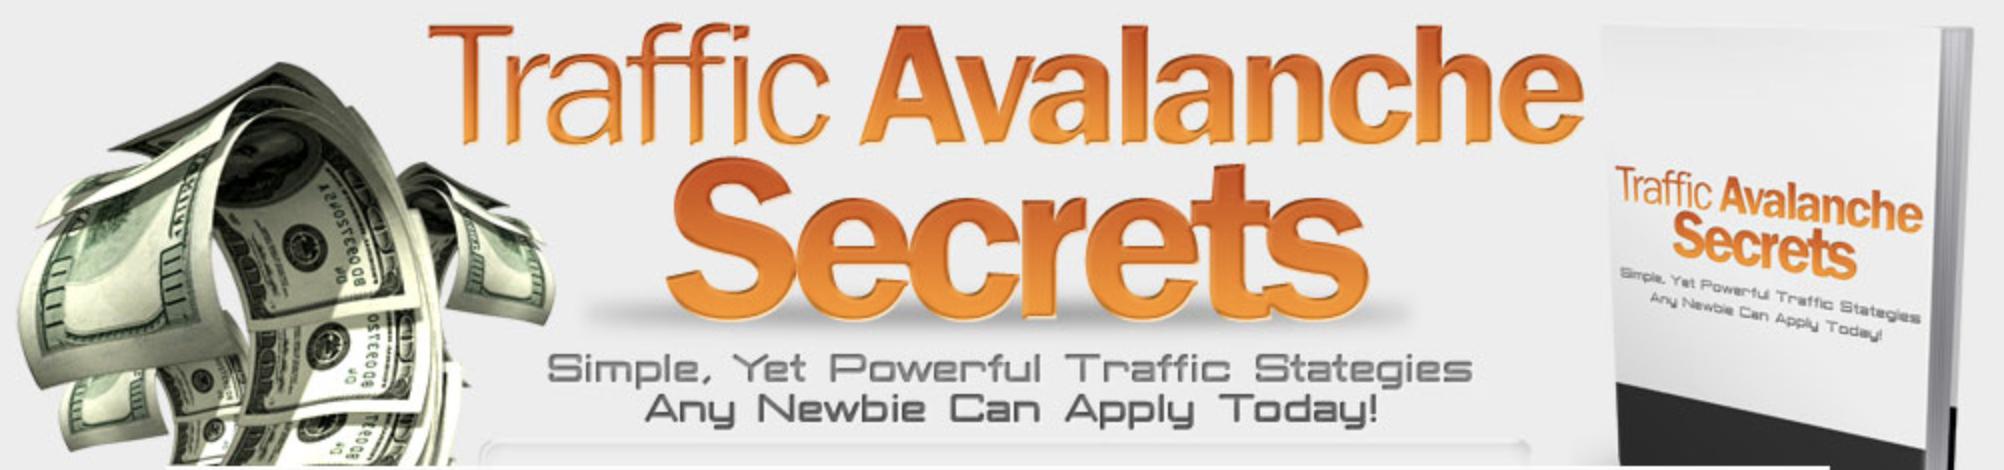 Traffic Avalanche - Trade secret traffic techniques!... (watch 1 min free video here...)